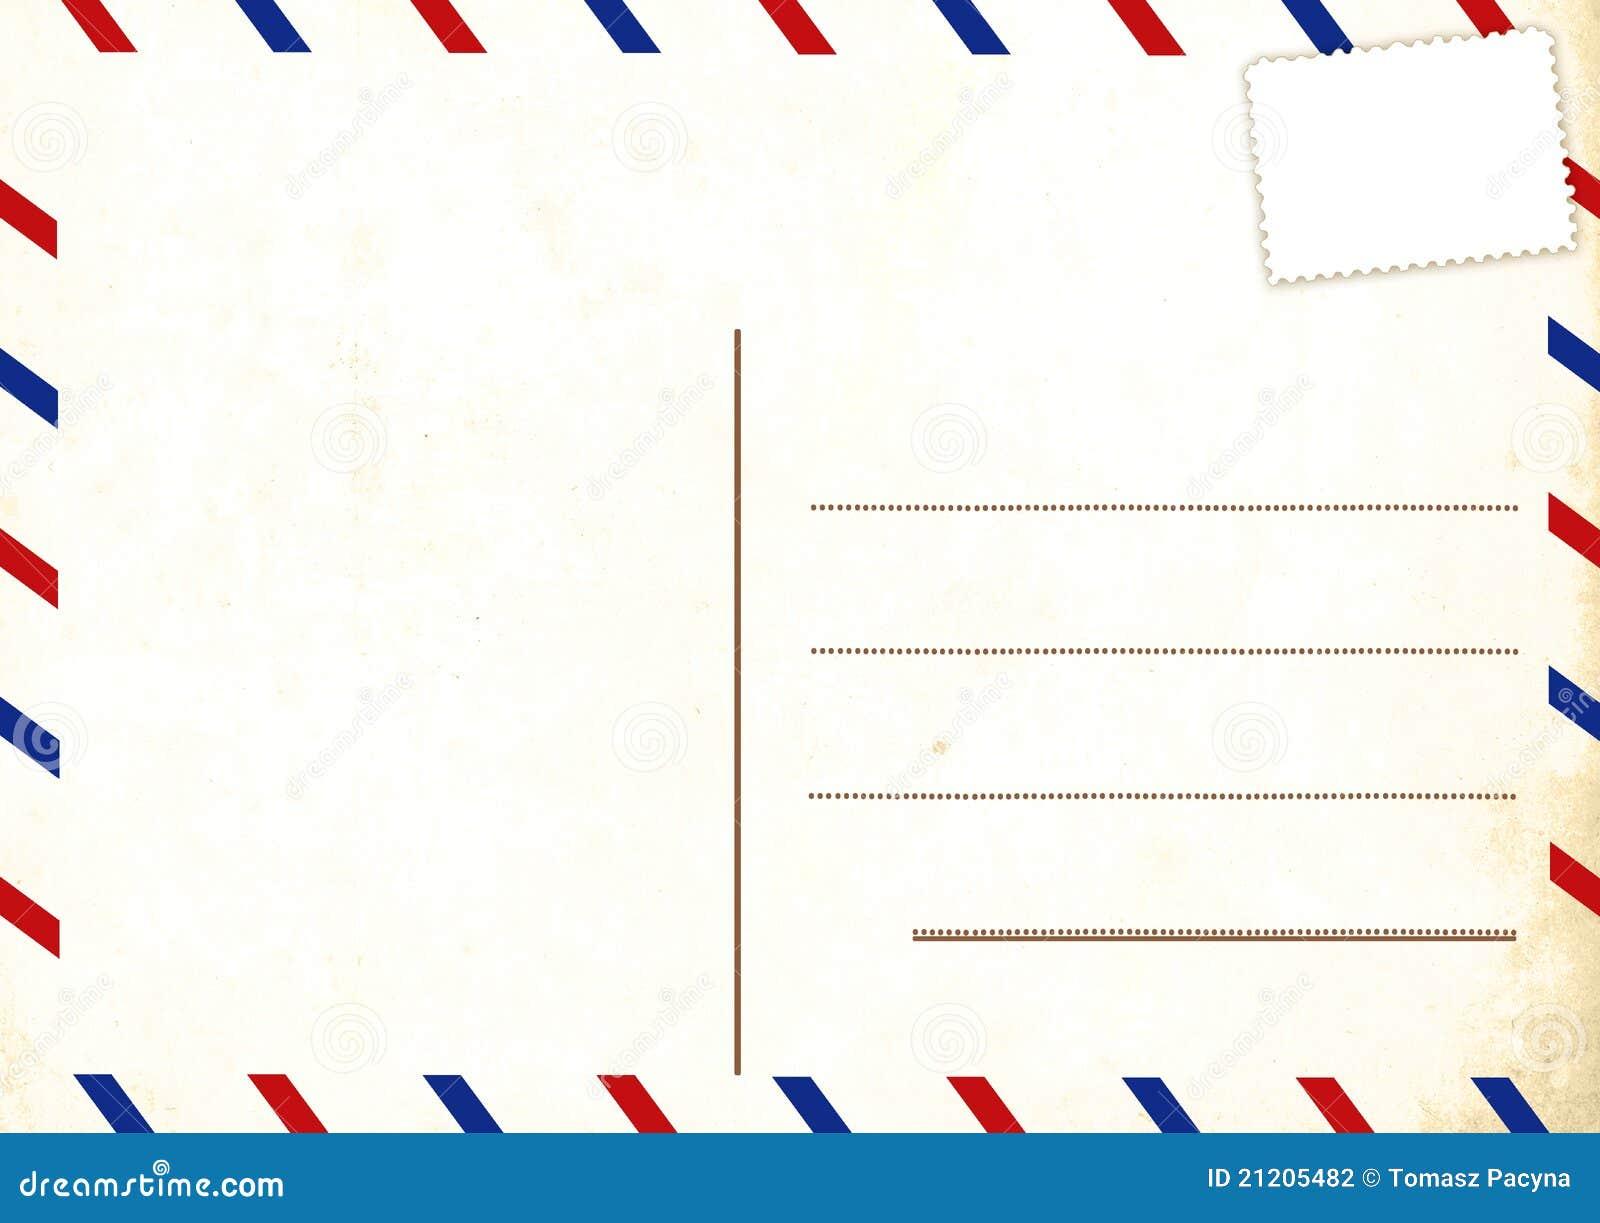 Leere Postkarte stock abbildung. Illustration von kunst - 21205482